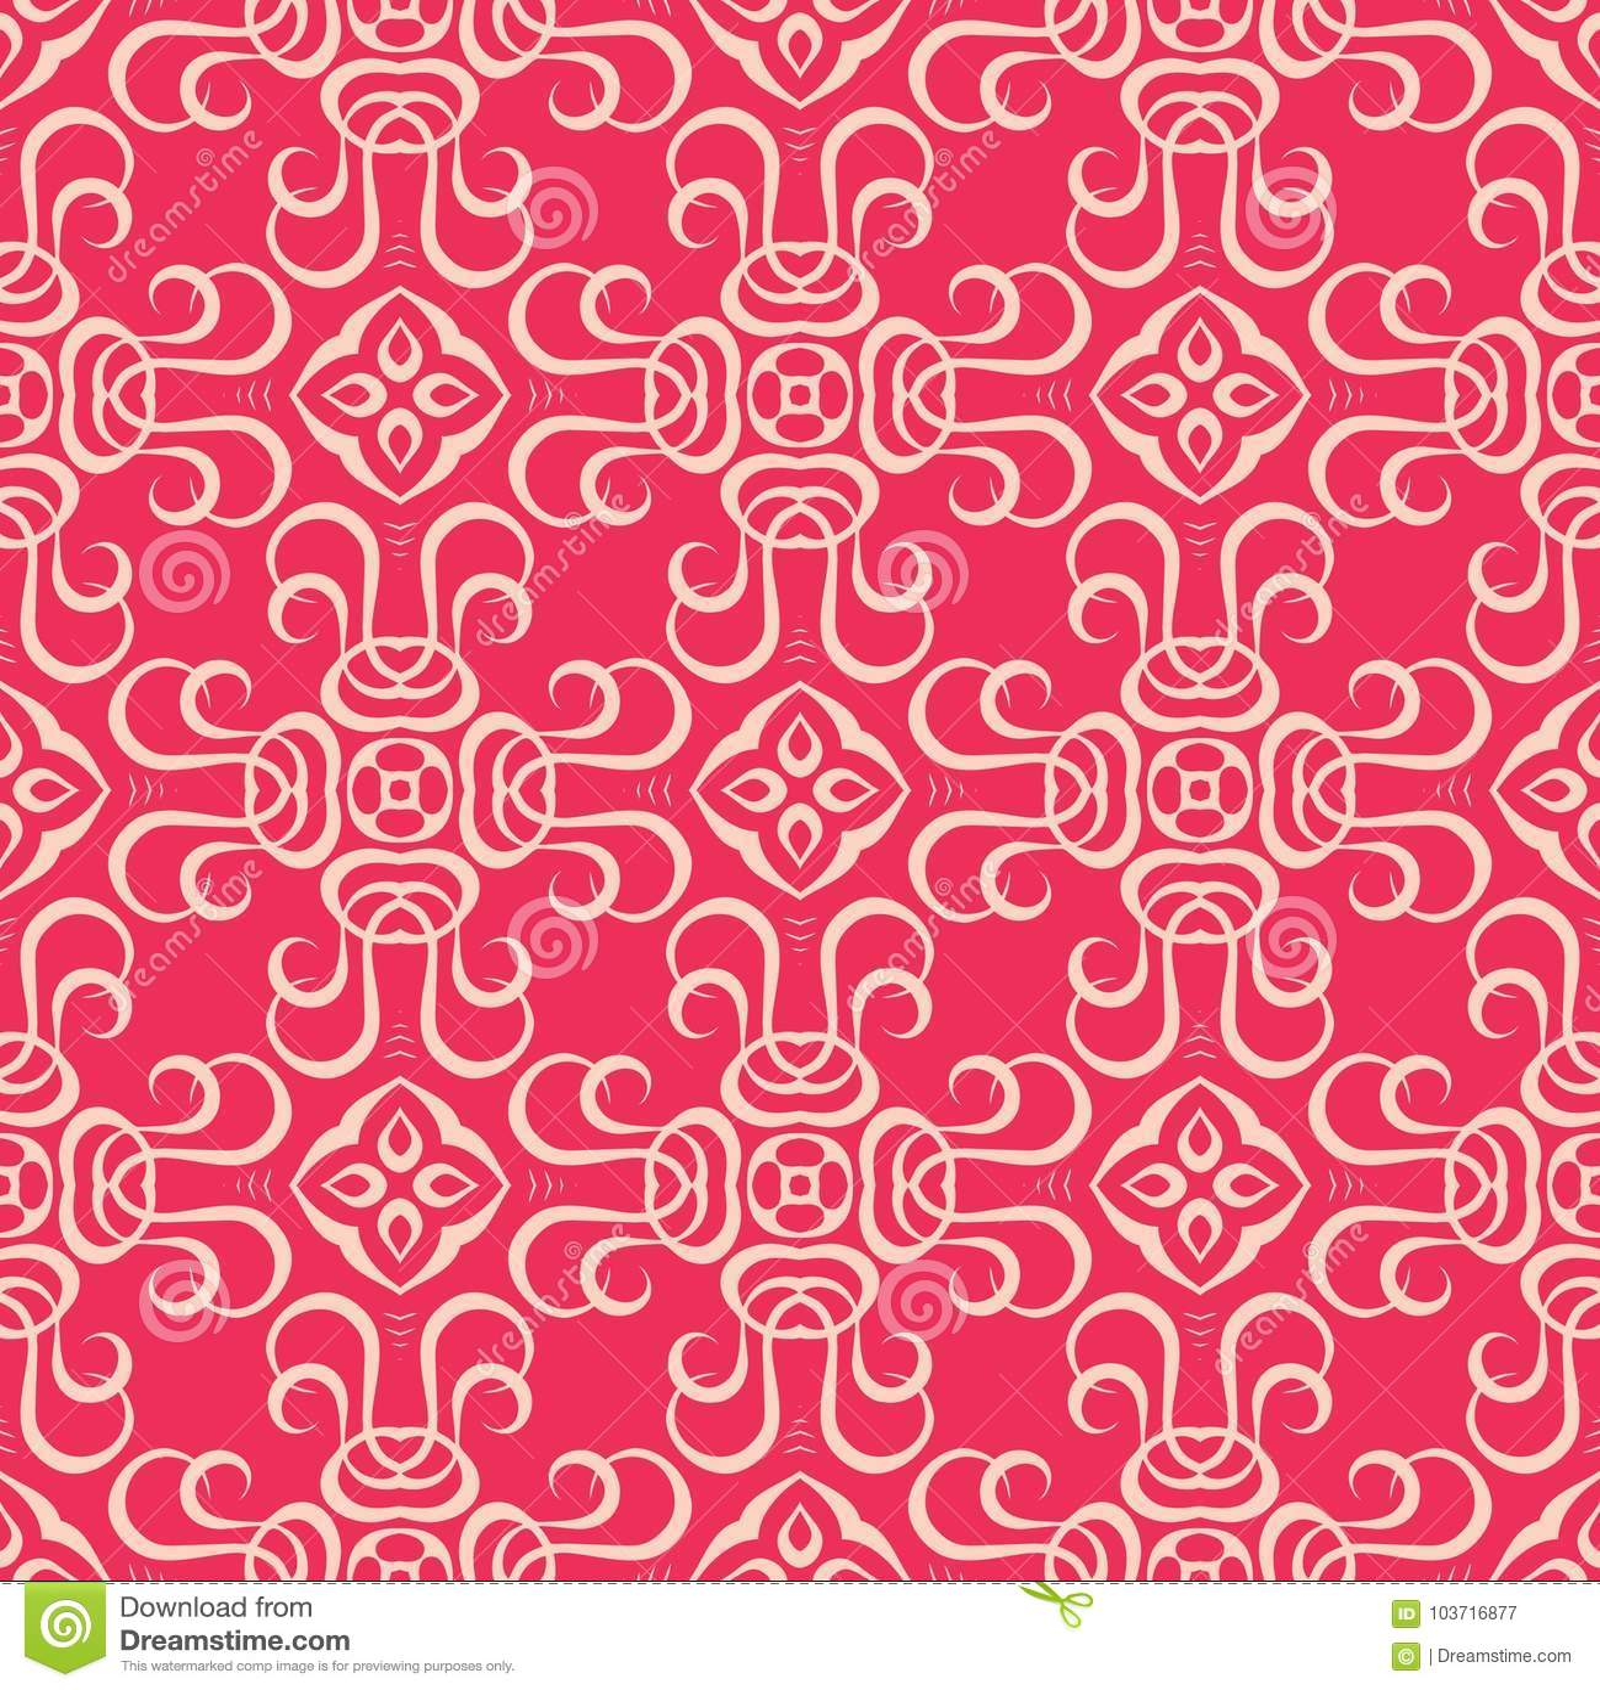 2d blocked Reddish pink base seamless pattern background illustration